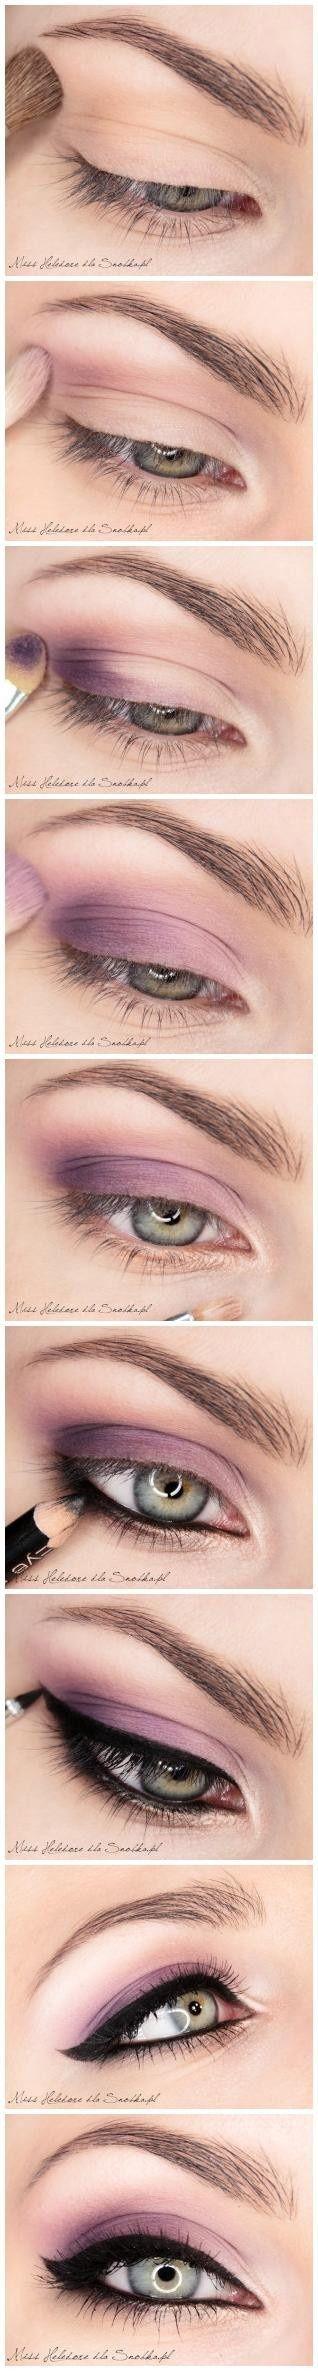 Homecoming Makeup For Hazel Eyes Pics Download